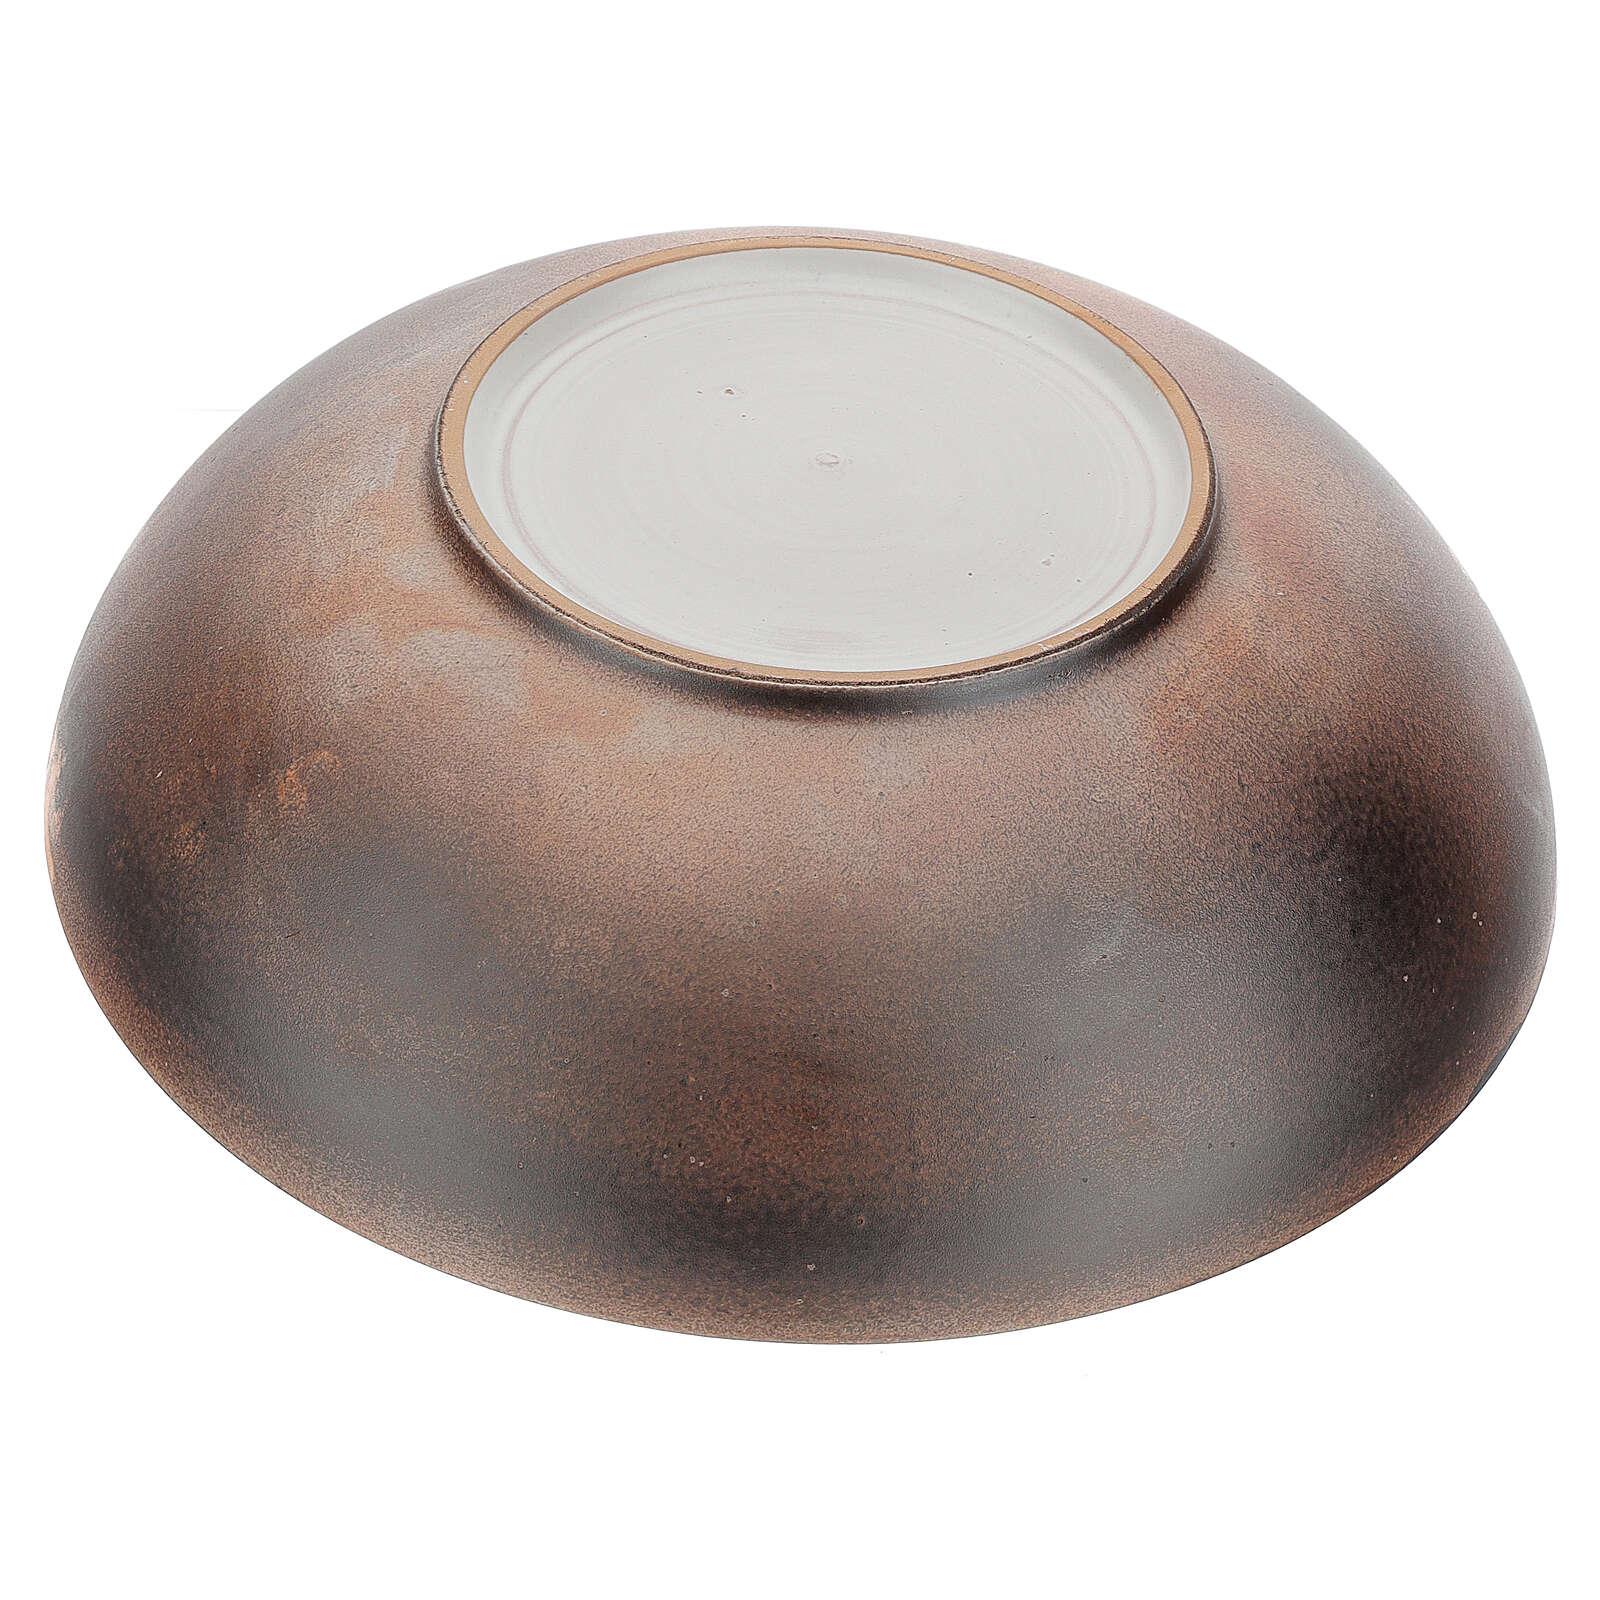 STOCK Plato jarra cóncavo cerámica Pompeya 30 cm 3